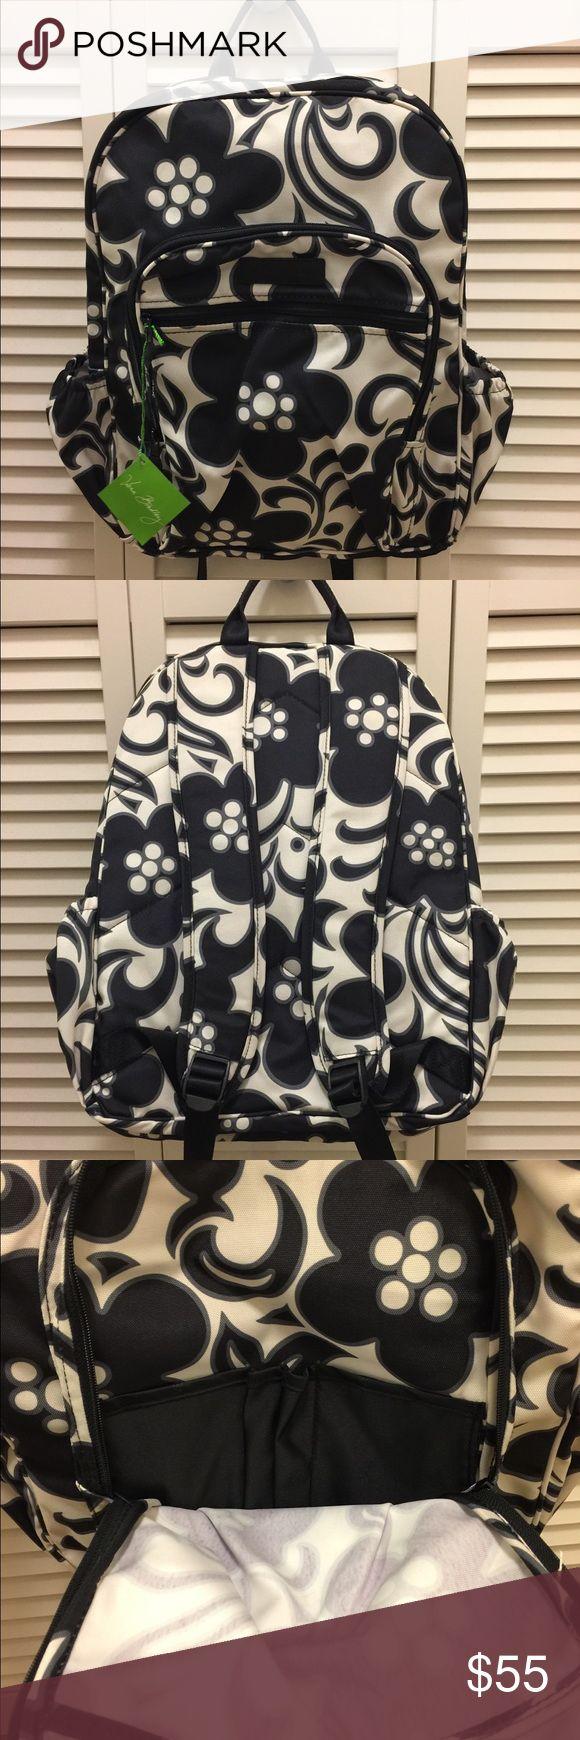 Spotted while shopping on Poshmark: Vera Bradley Lightweight Backpack! #poshmark #fashion #shopping #style #Vera Bradley #Handbags